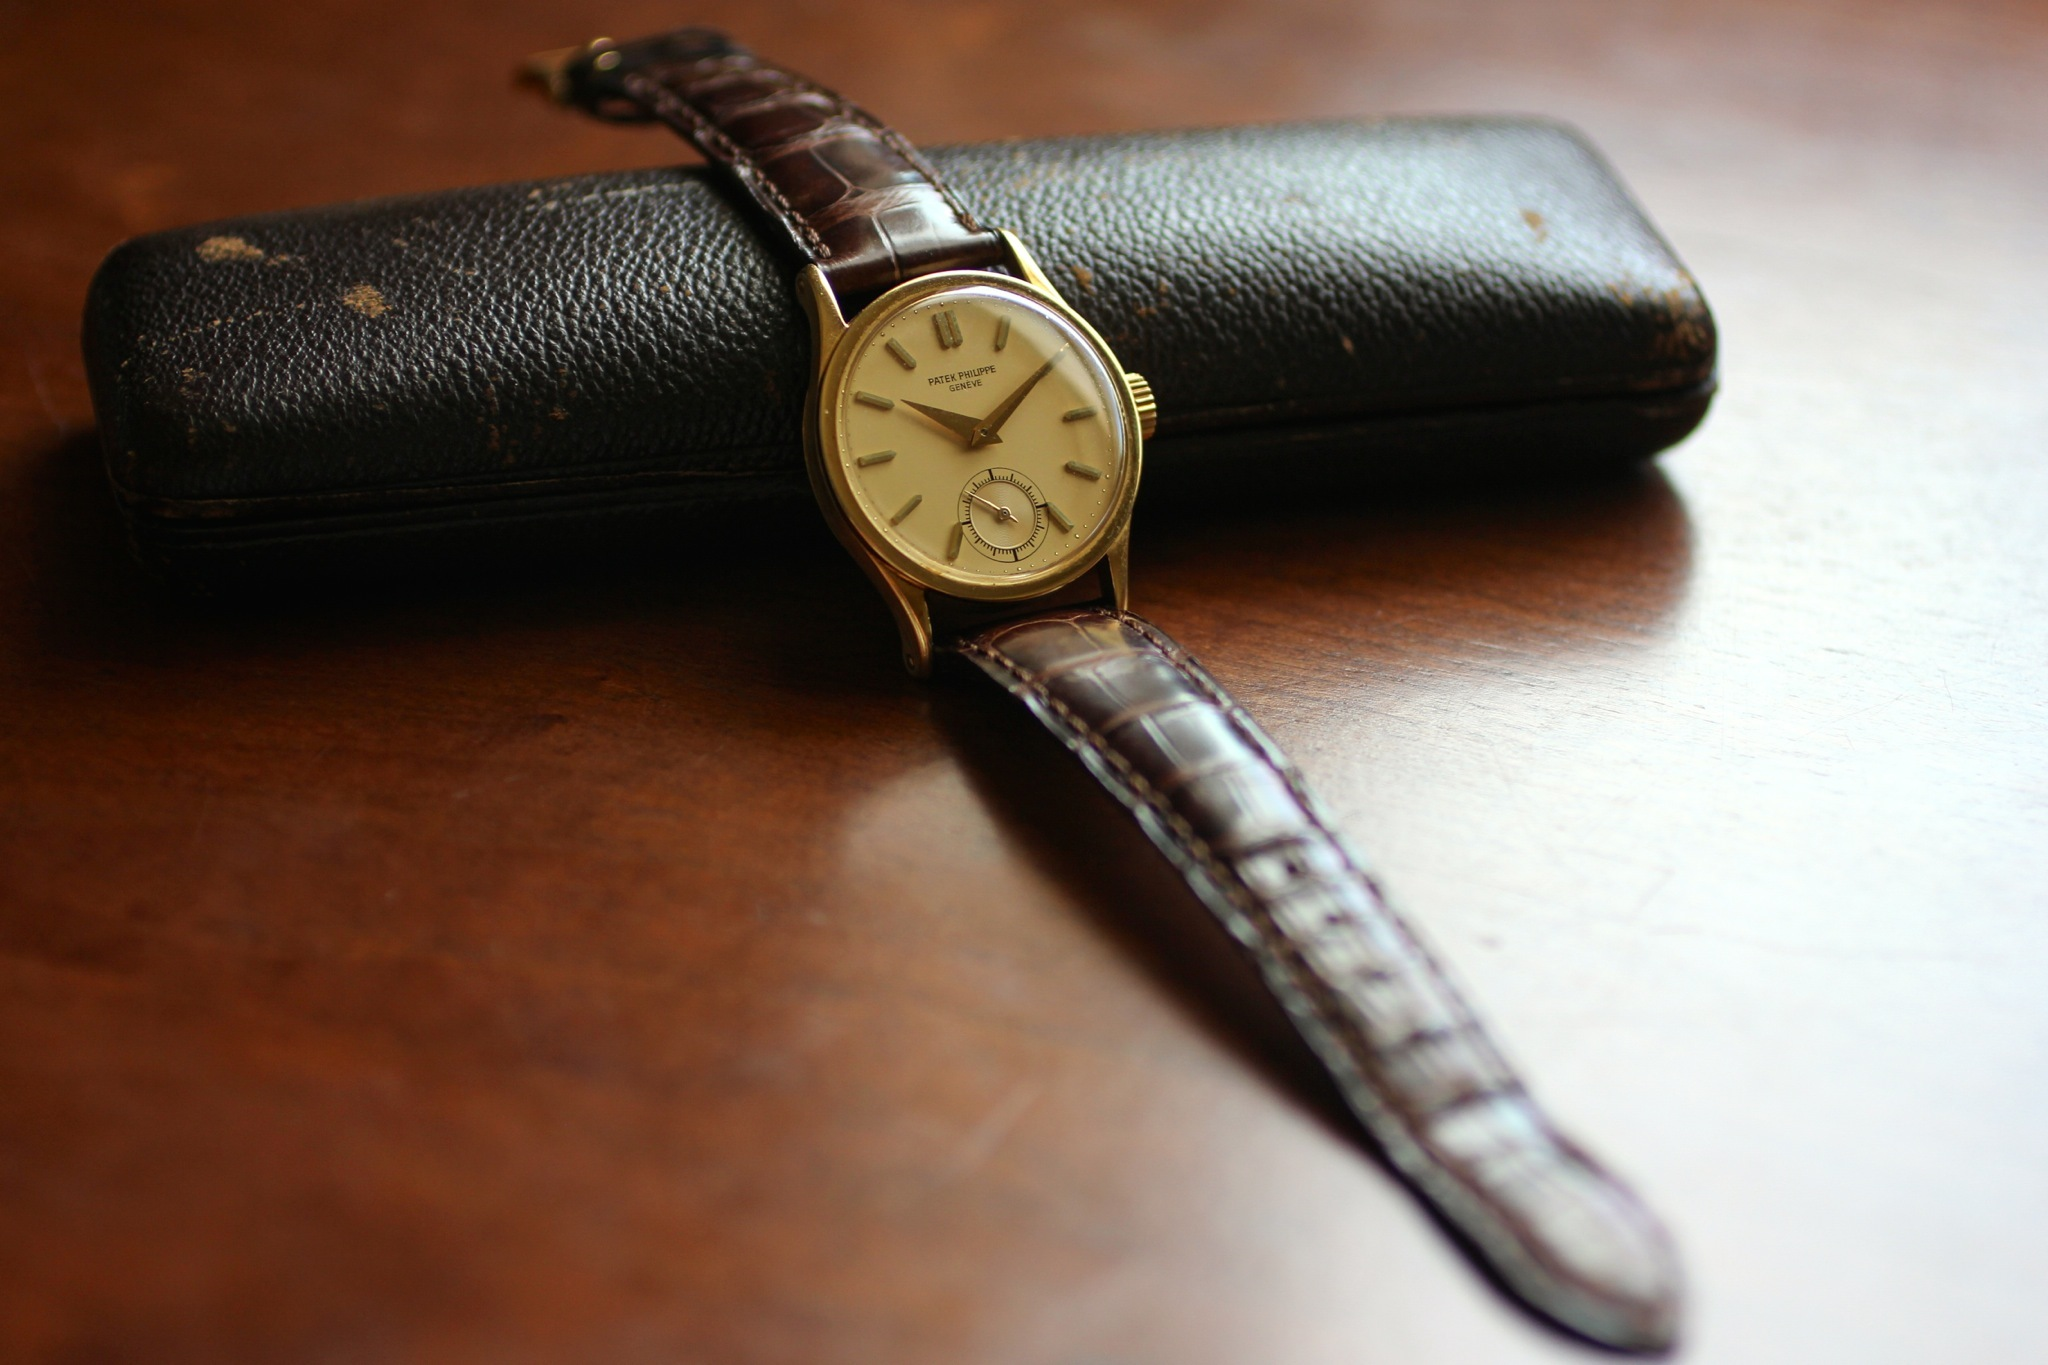 Patek Philippes erste Armbanduhr, die Calatrava Reference #96